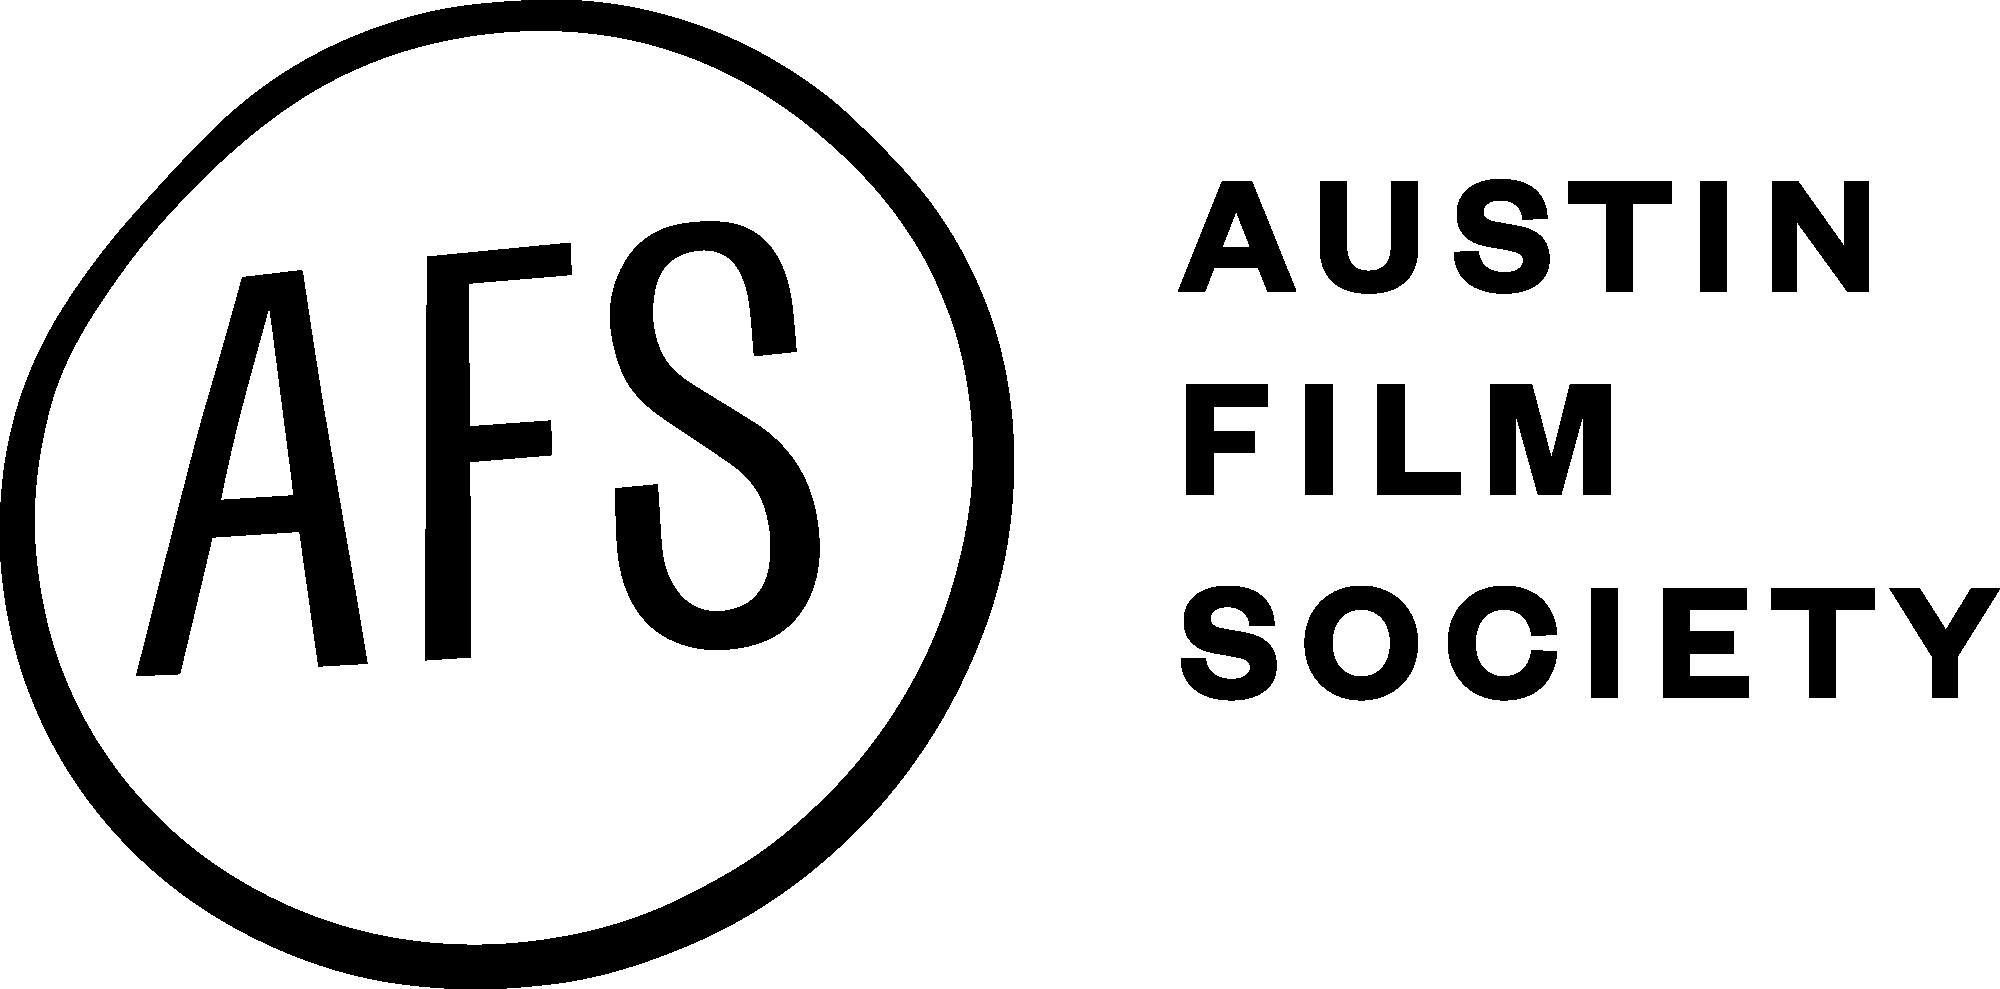 AFS_AustinFilmSociety_Lockup_02_Black_RGB.png